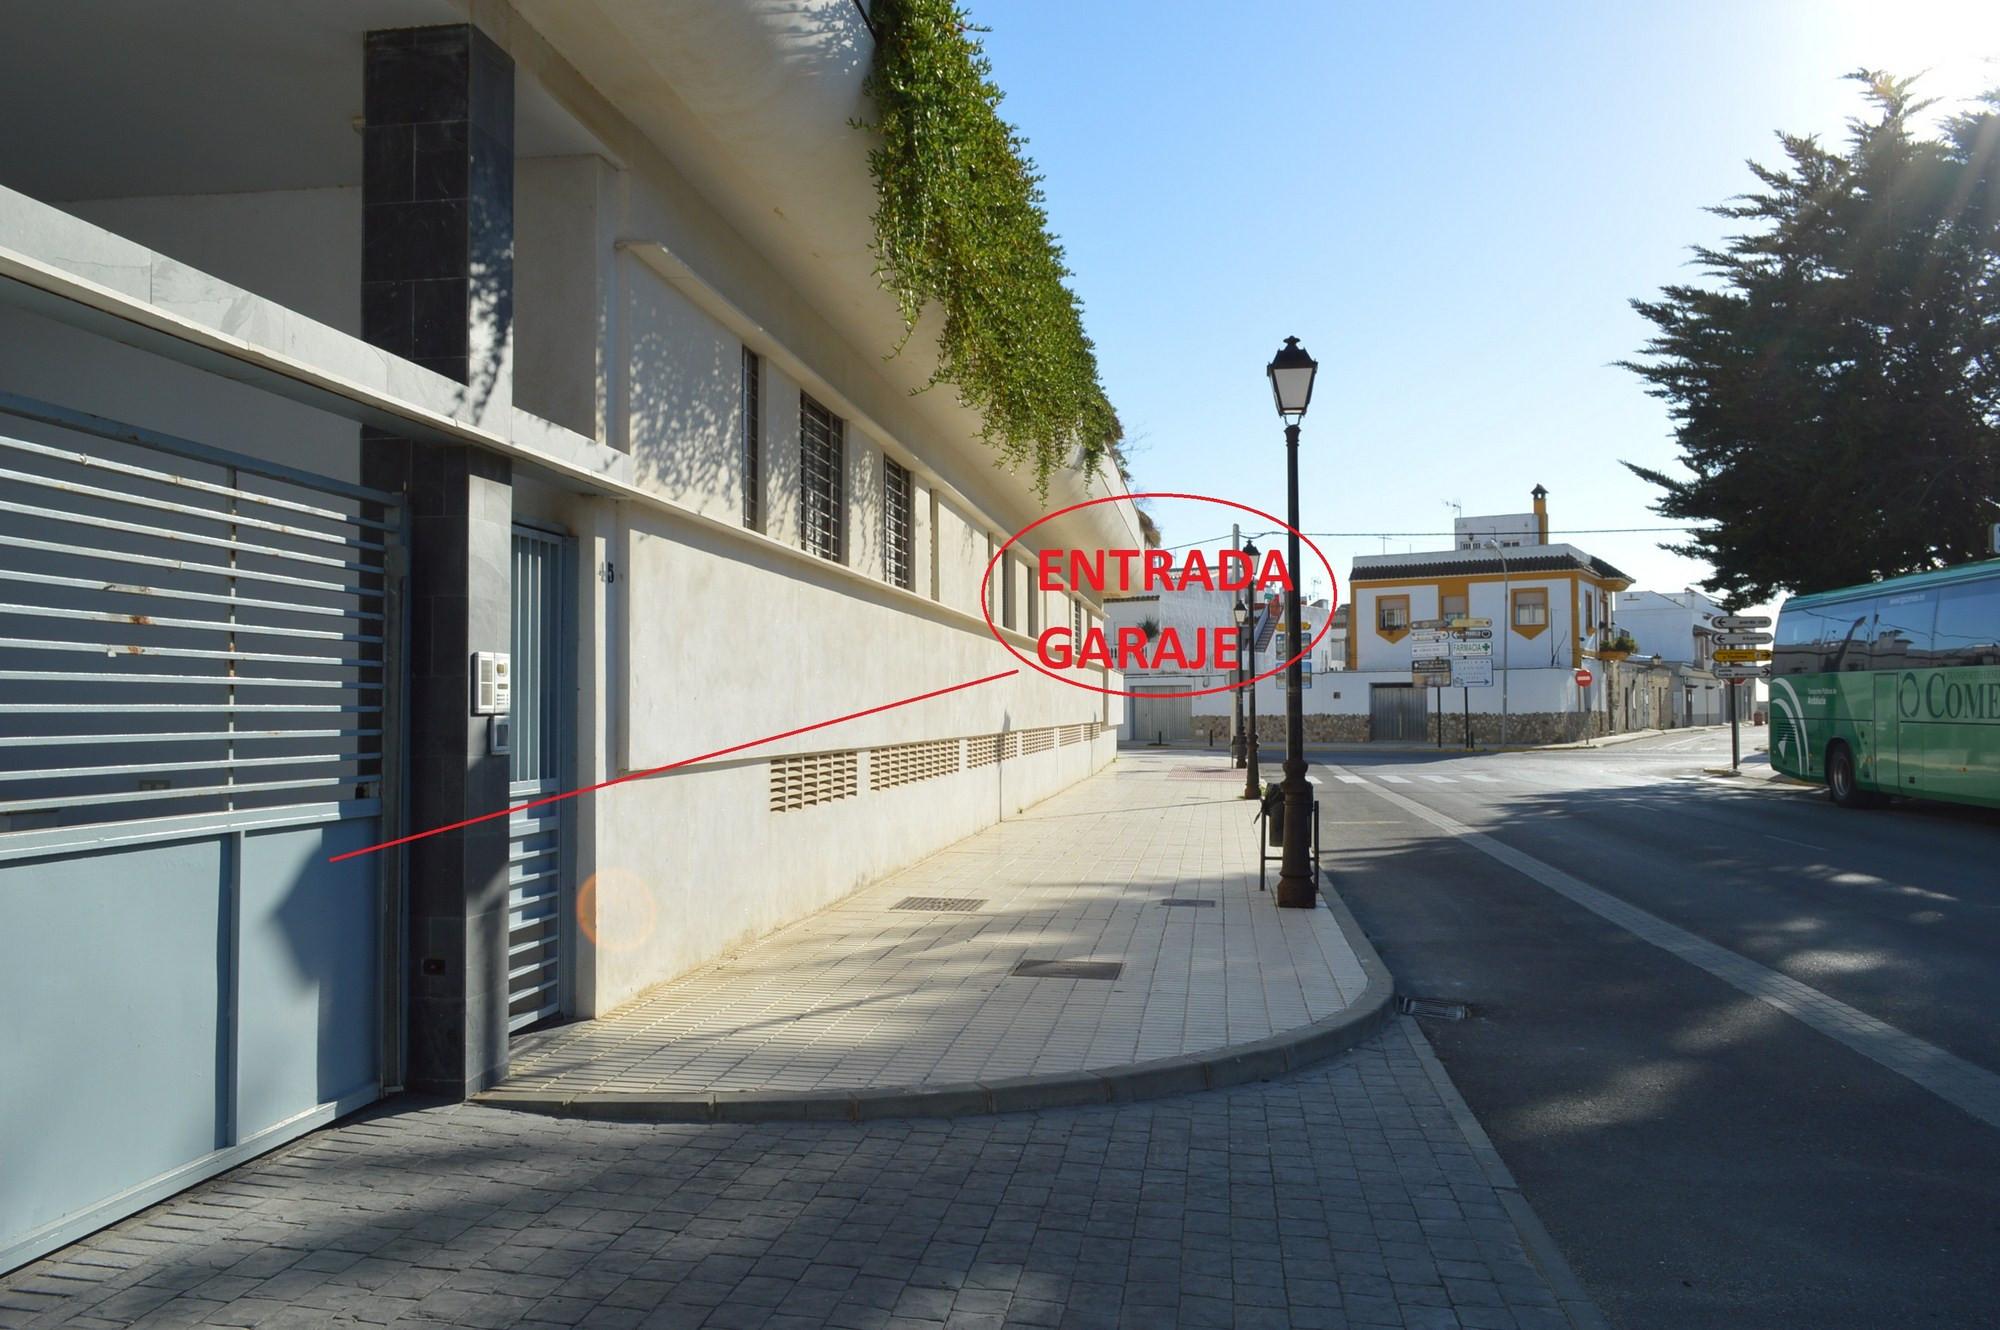 Aires de Zahara - Entrada Garaje